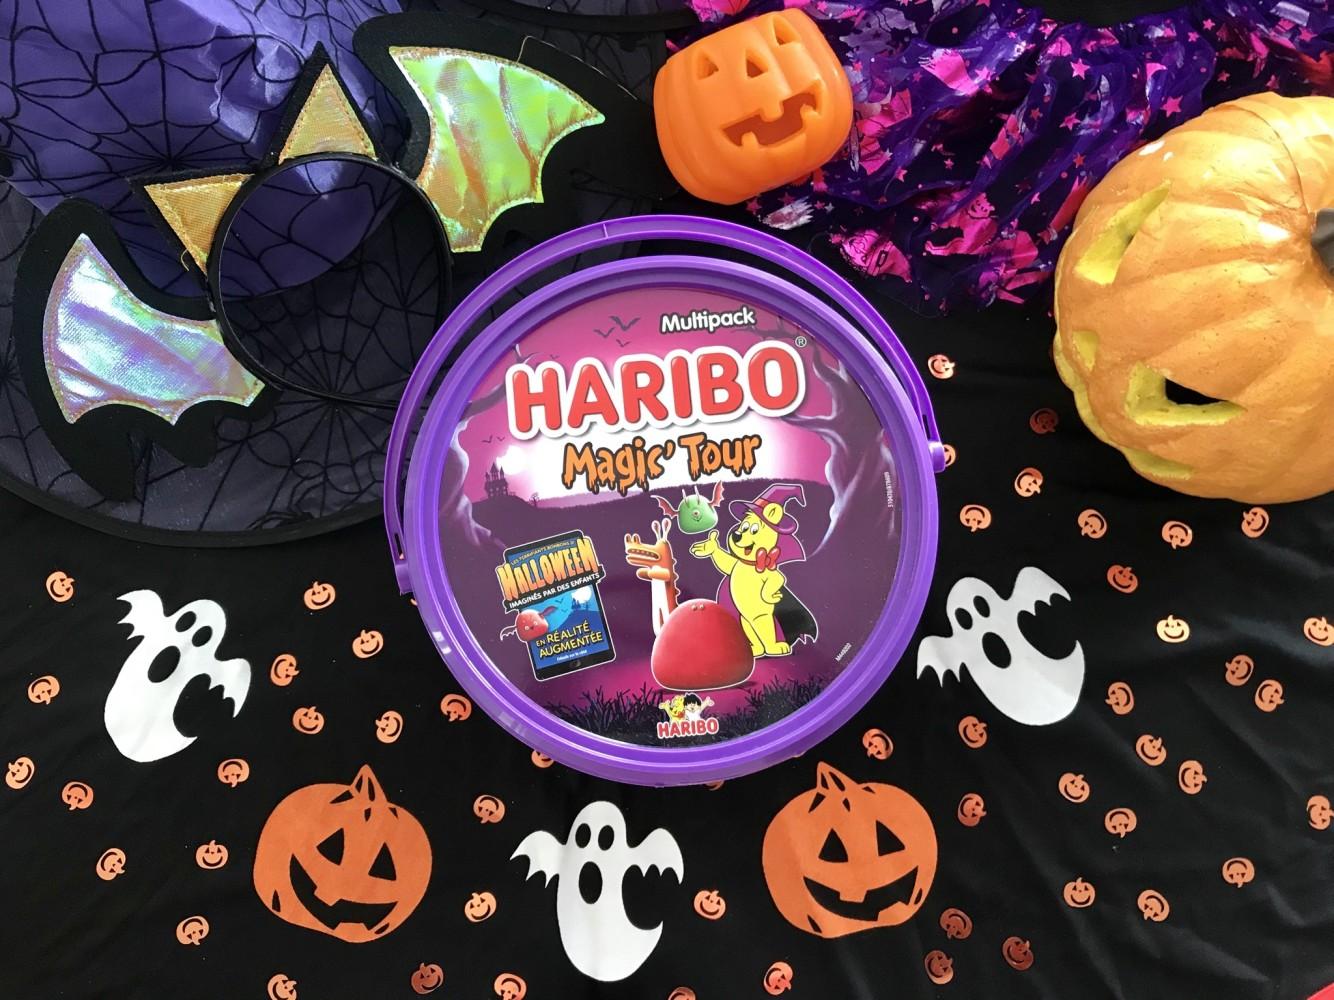 Bonbons Haribo Halloween concours